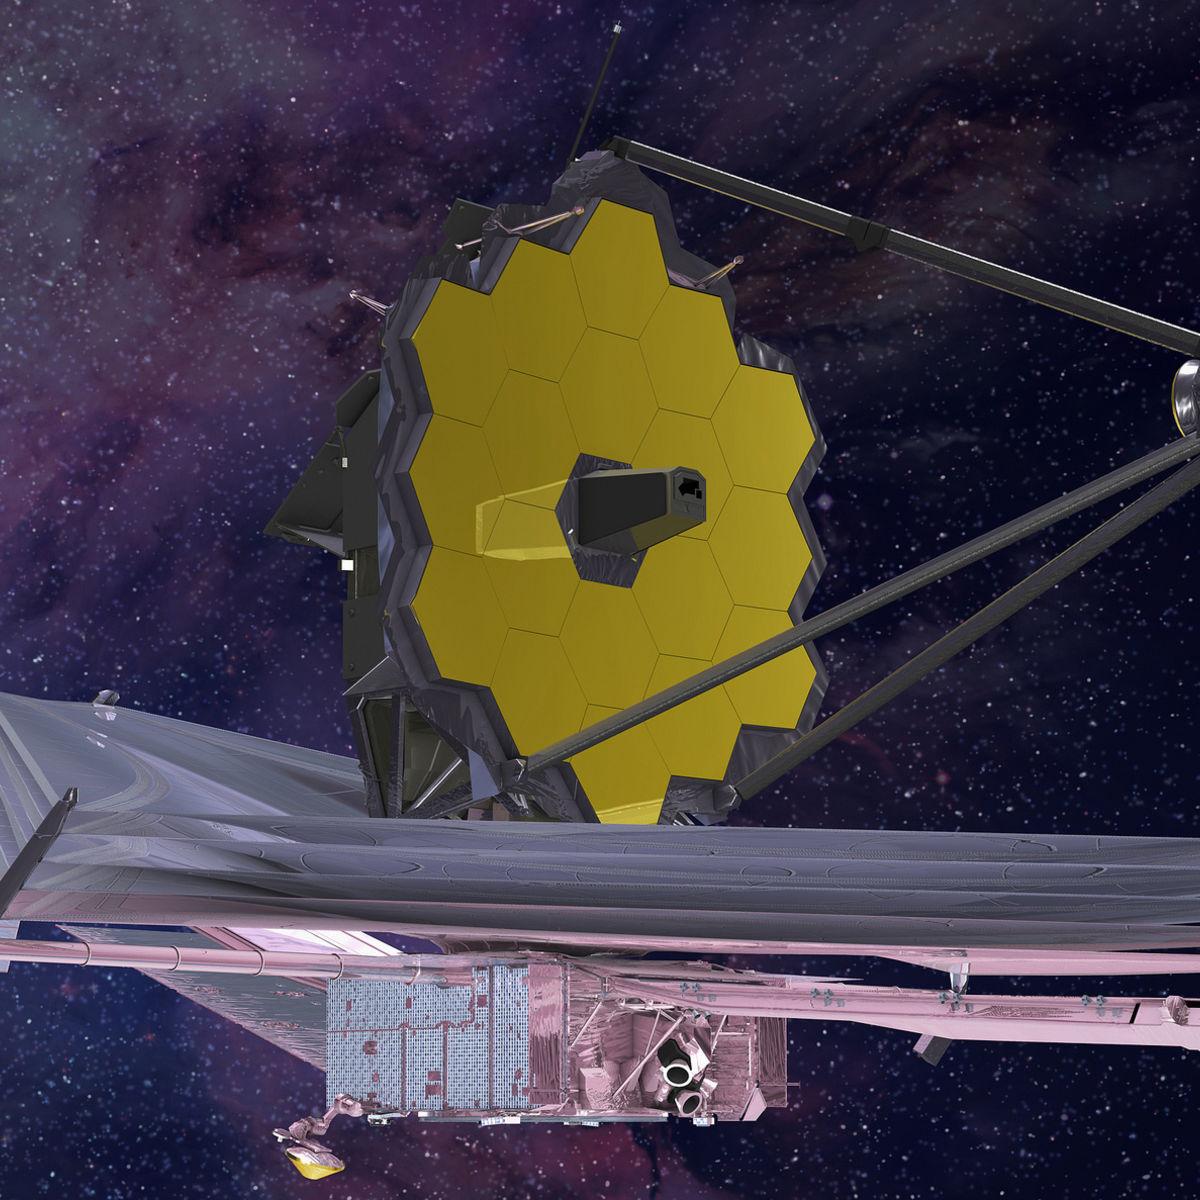 Artwork showing JWST after full deployment 1.5 million km from Earth. Credit: Northrup Grumman